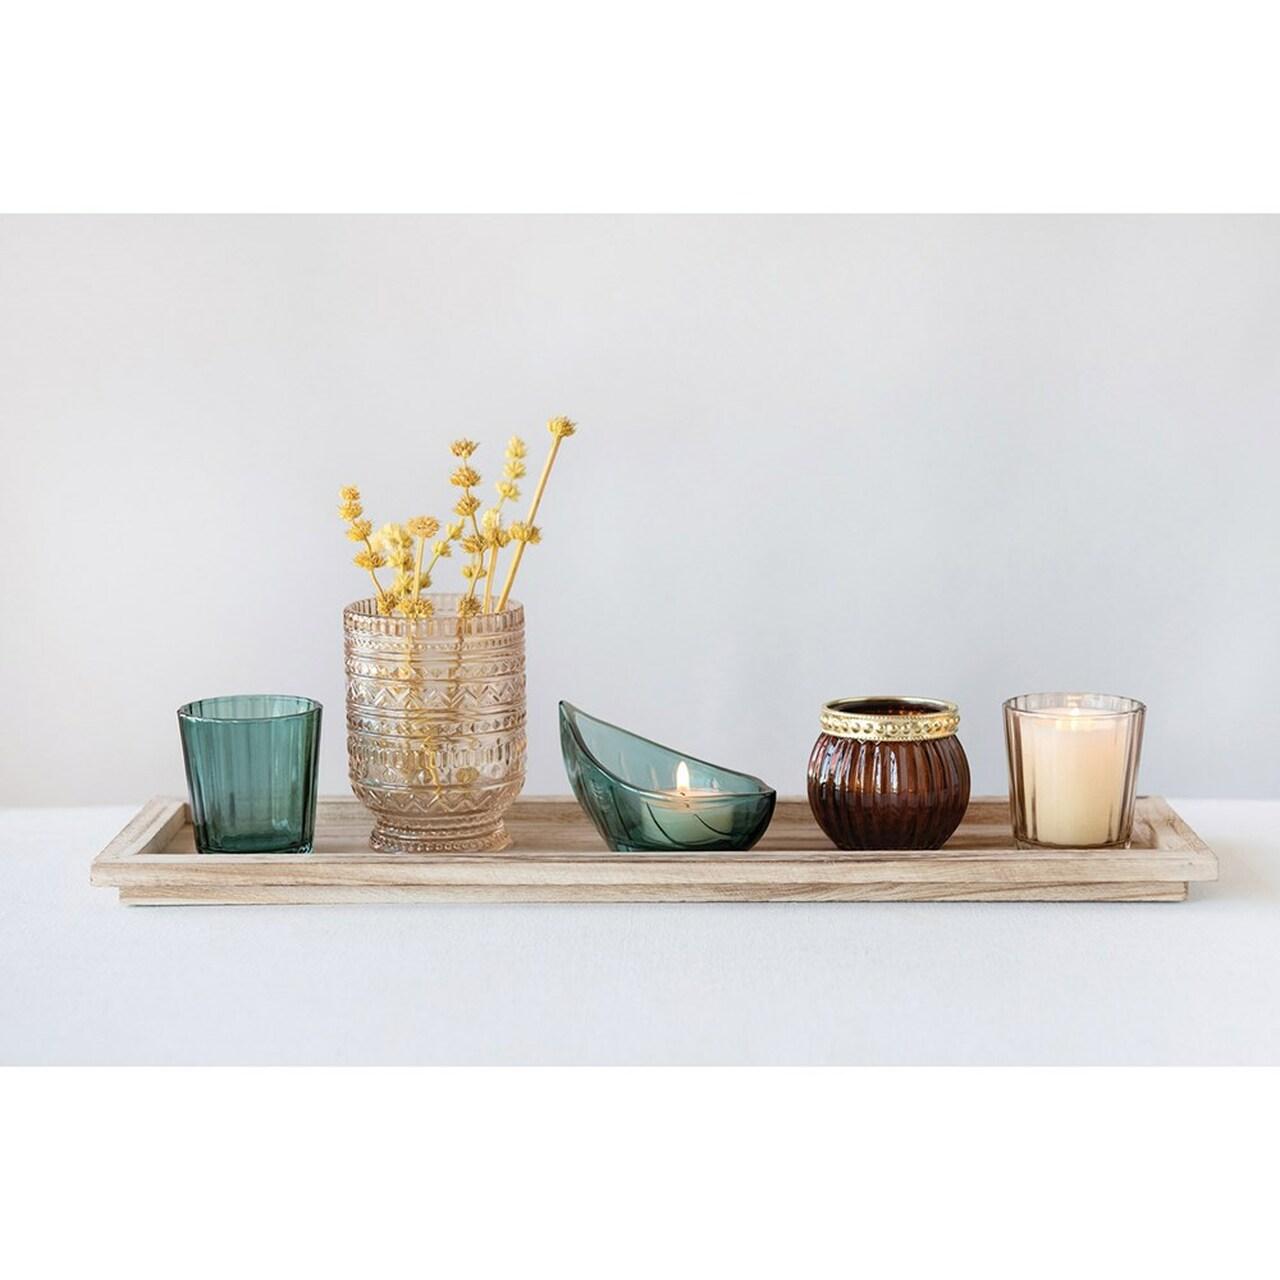 Paulownia Wood Tray with 5 Glass Votive Holders